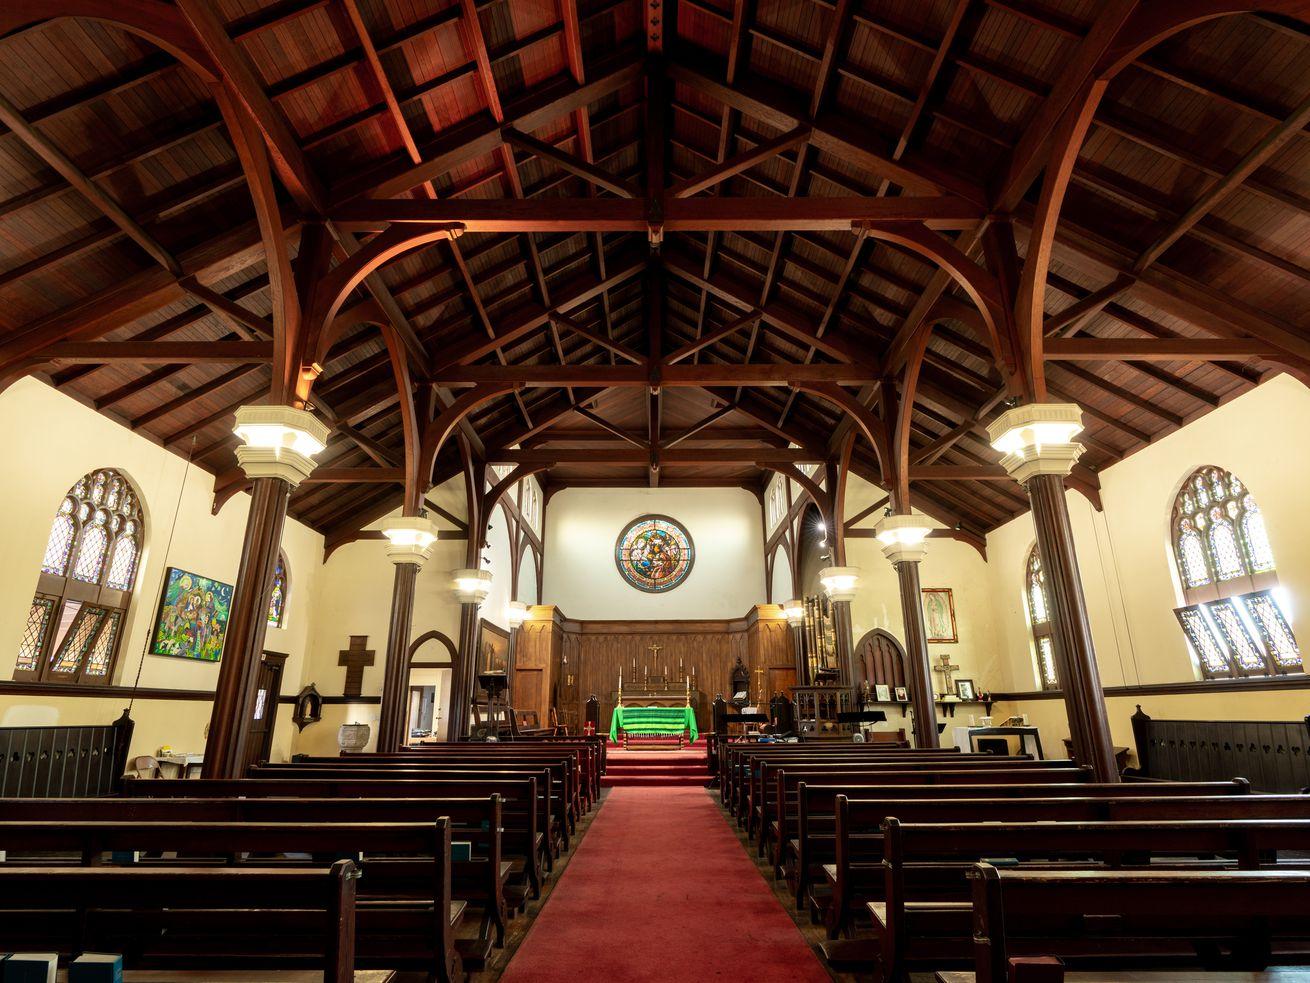 A 2018 photo show's the church's interior.